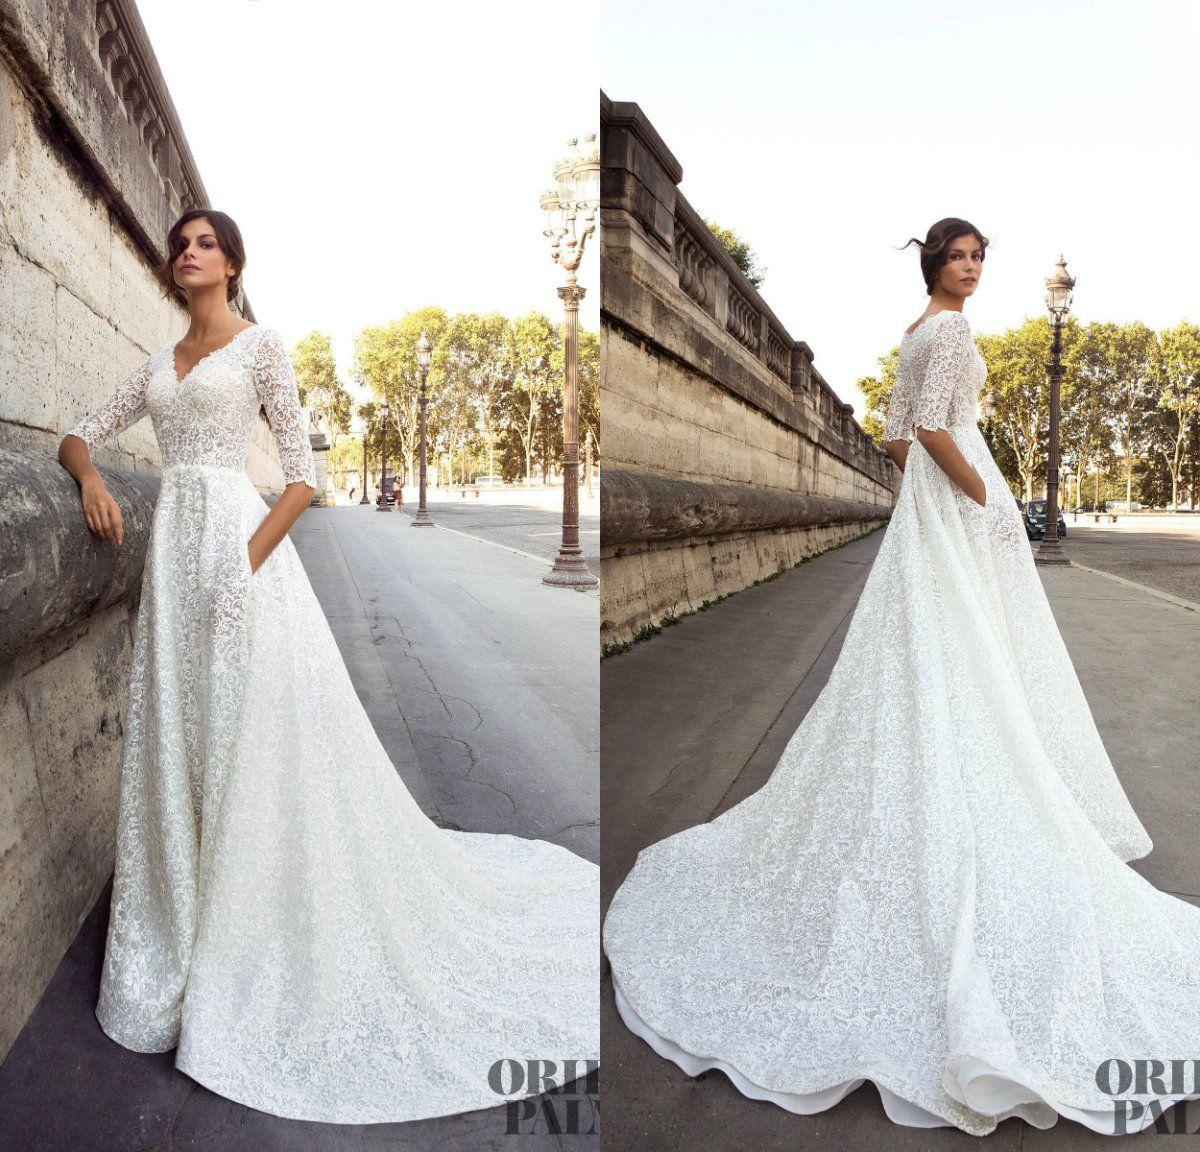 d6ba7cdba3 Discount Luxury Appliques Beach Wedding Dresses With Pocket V Neck Half  Long Sleeve Court Train Custom Made Bohemian Wedding Dress Bridal Gowns  Dress For ...